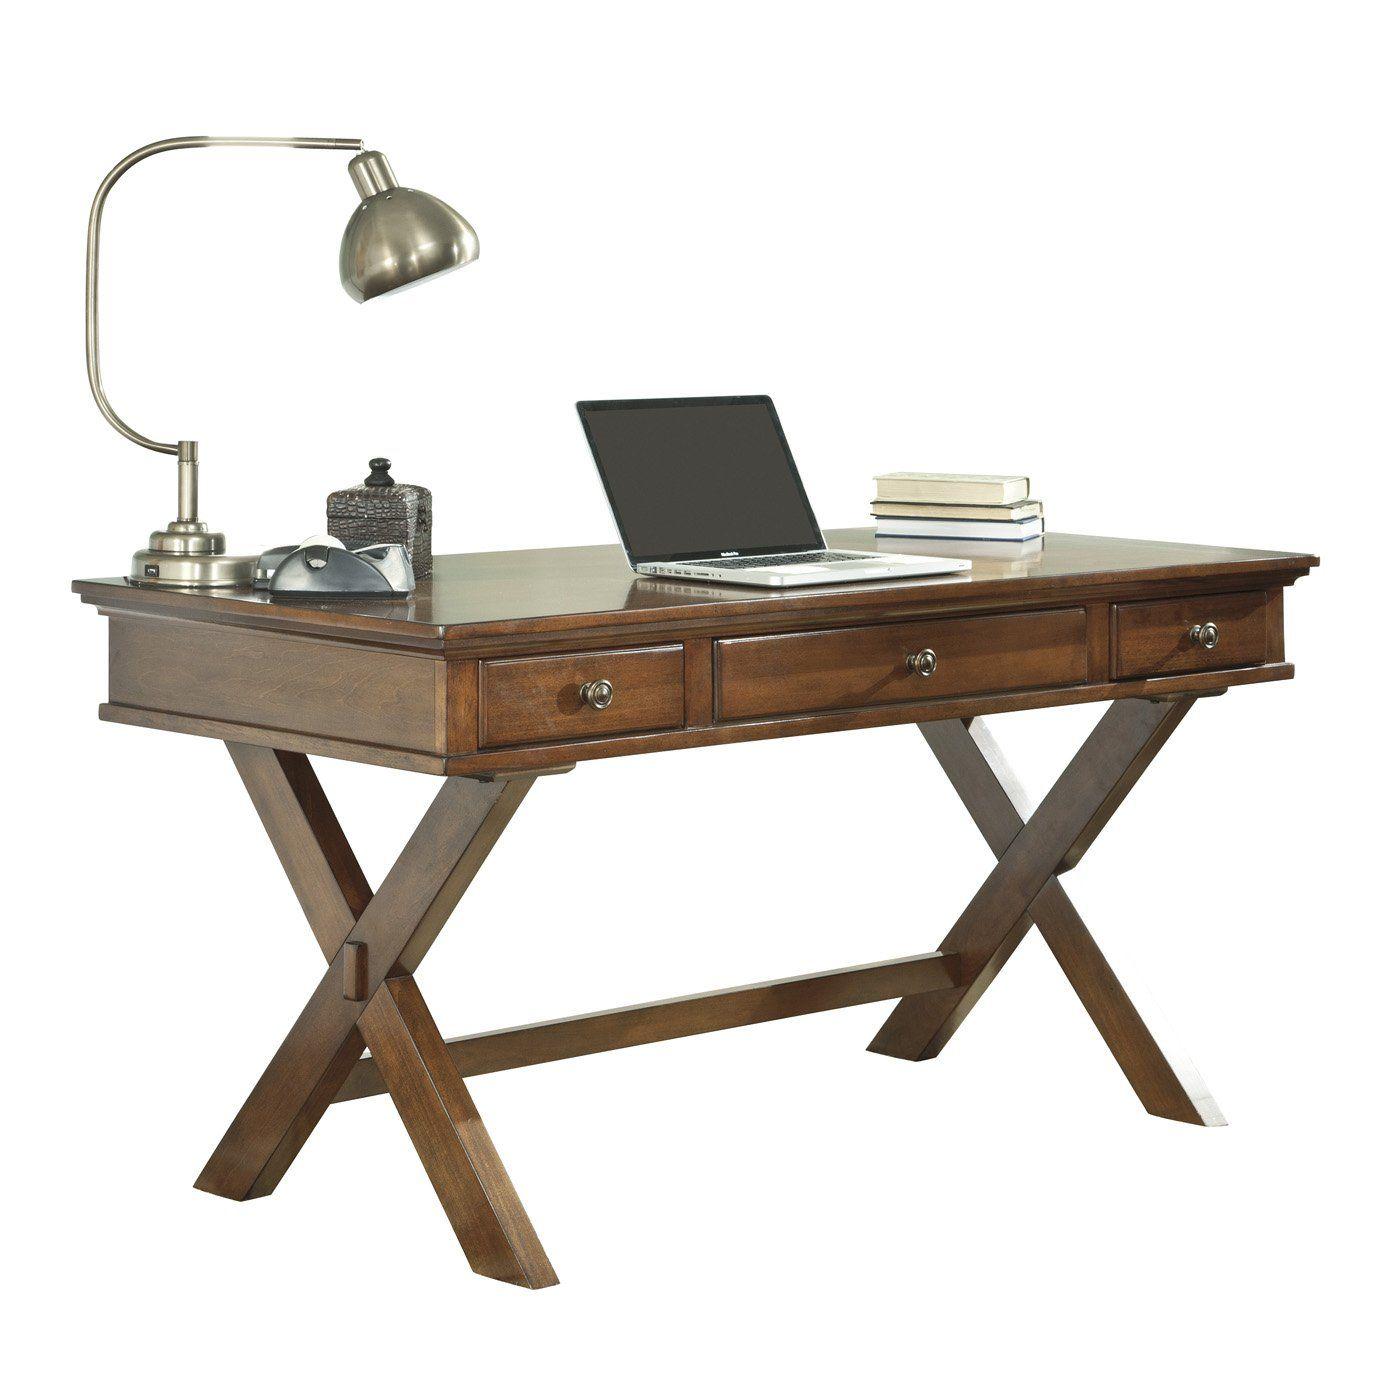 Shop Signature Design by Ashley H565-45 Burkesville Home Office Desk ...